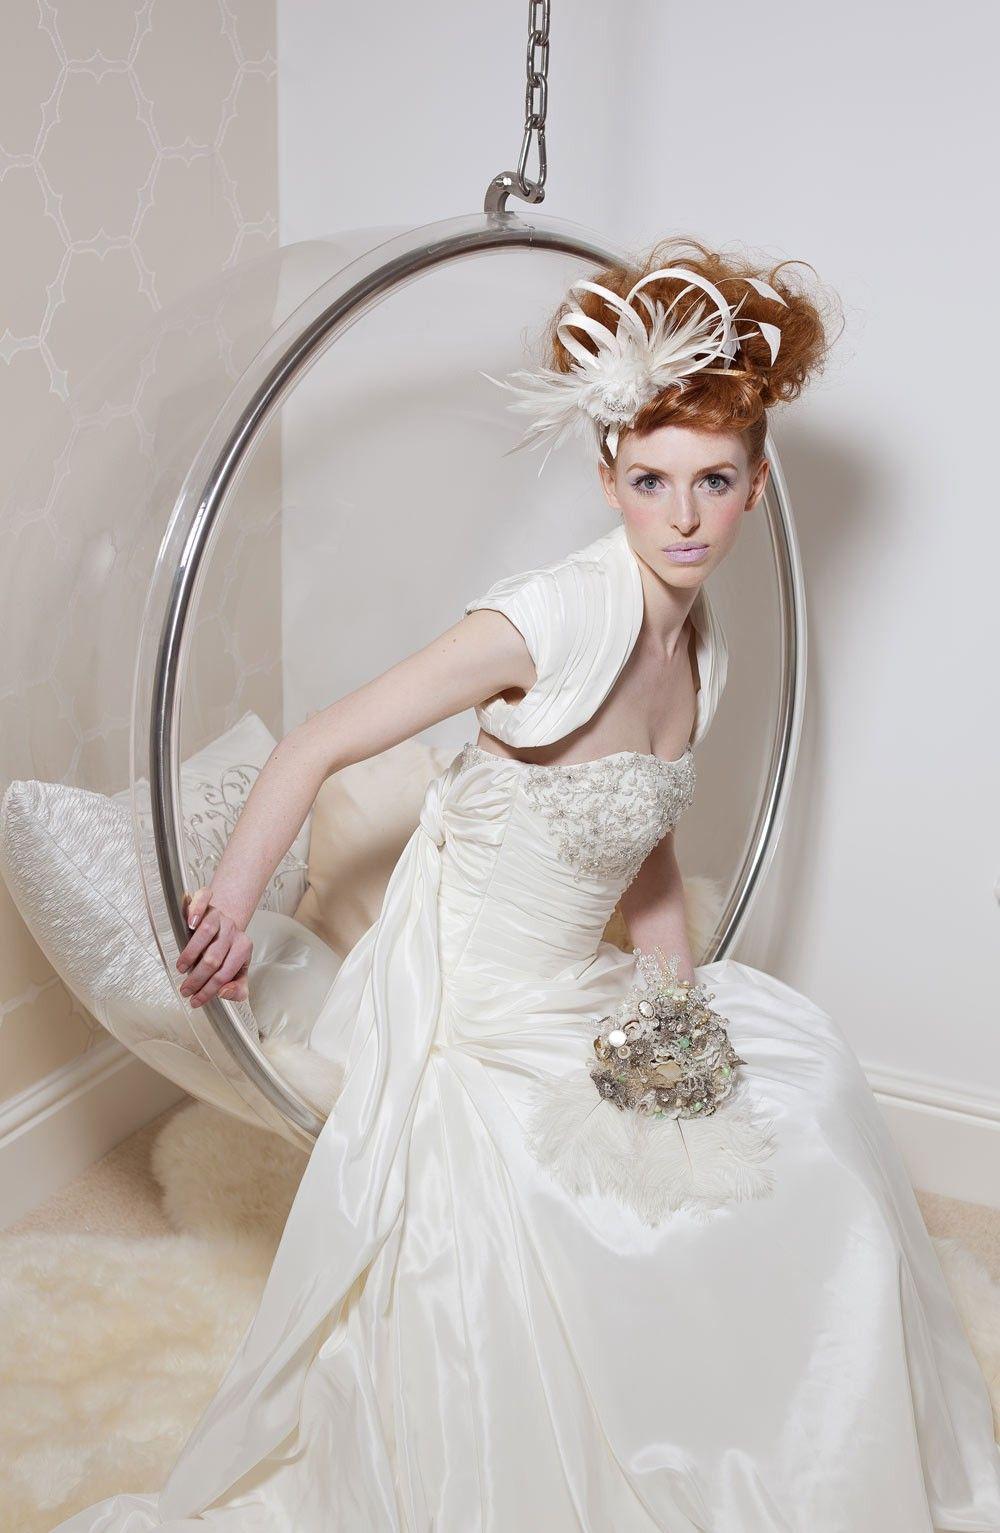 D'Zage Little Anne Maids Wedding dresses, Dresses